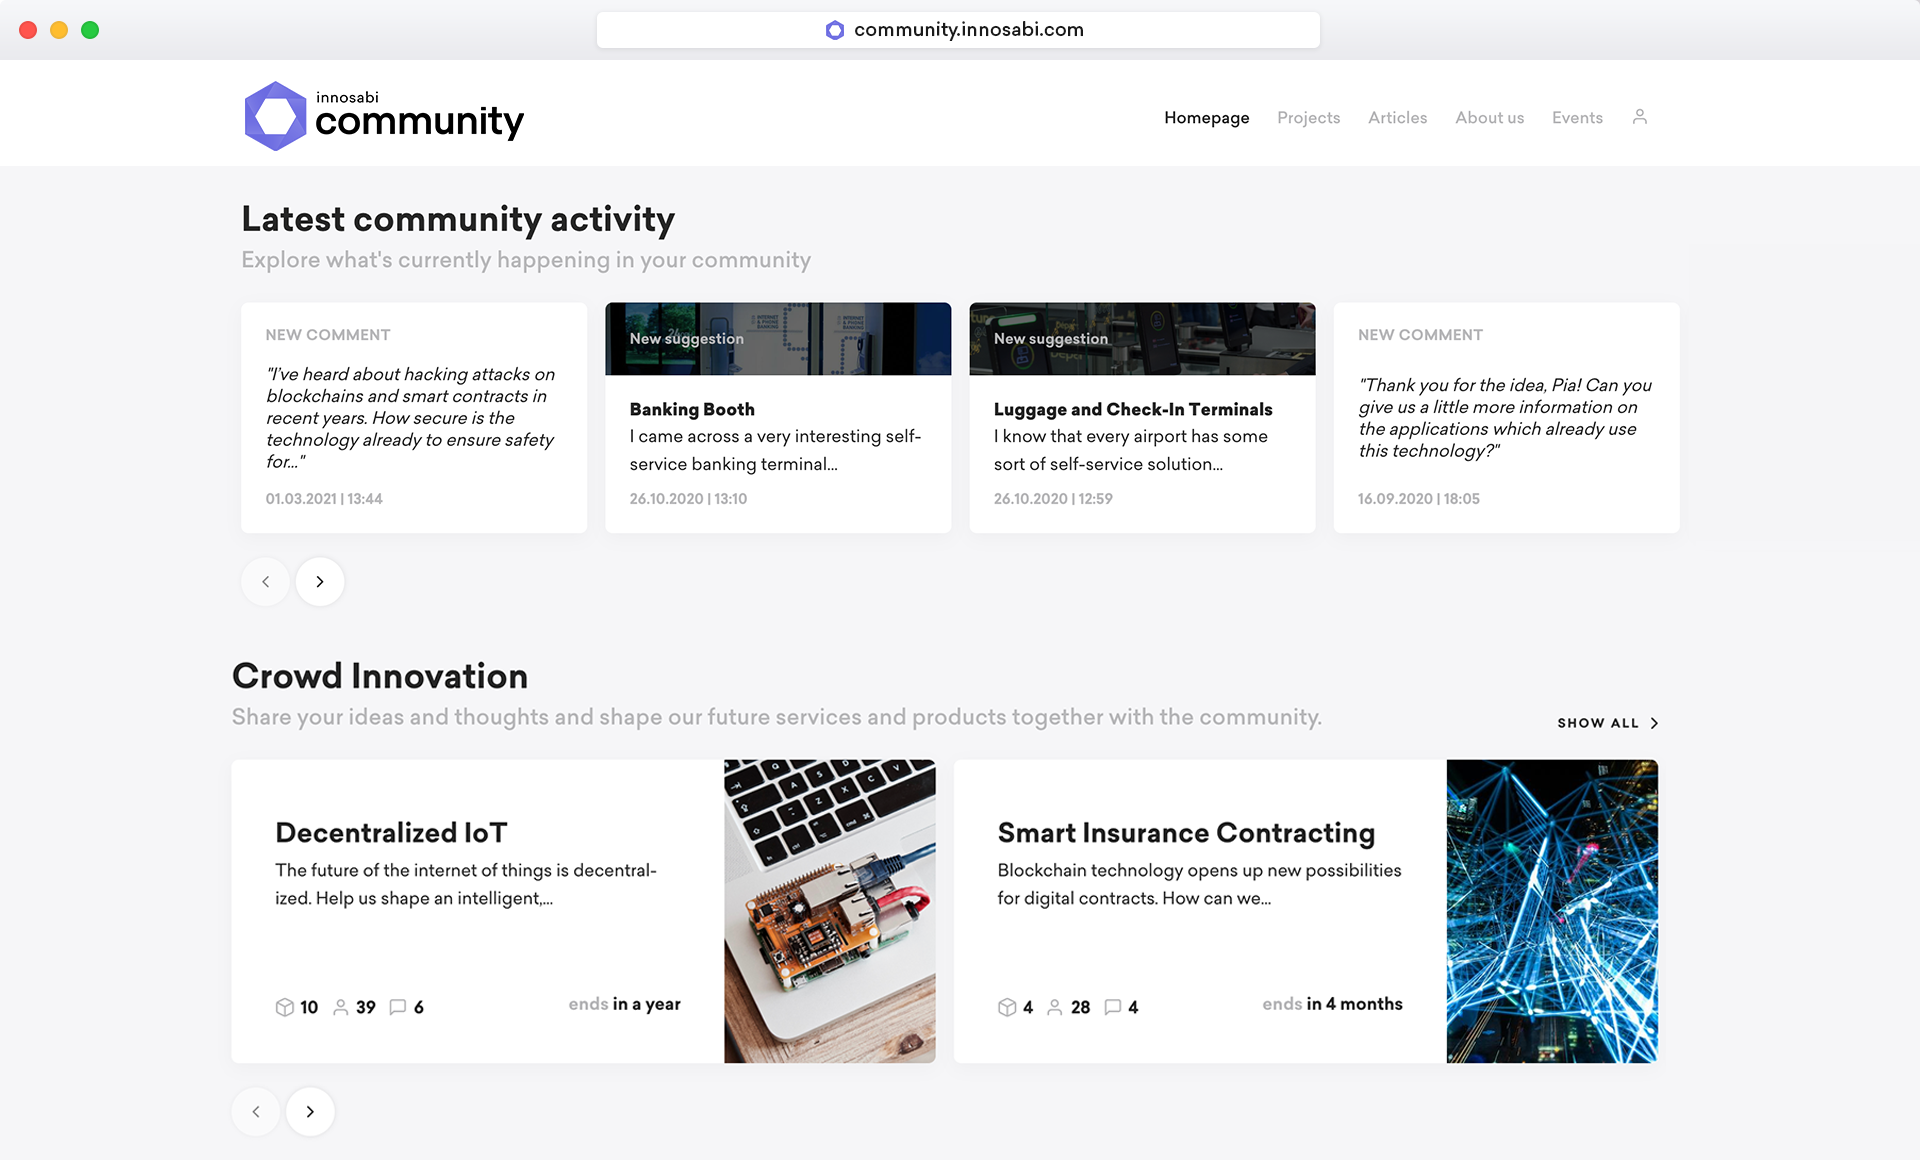 innosabi community software